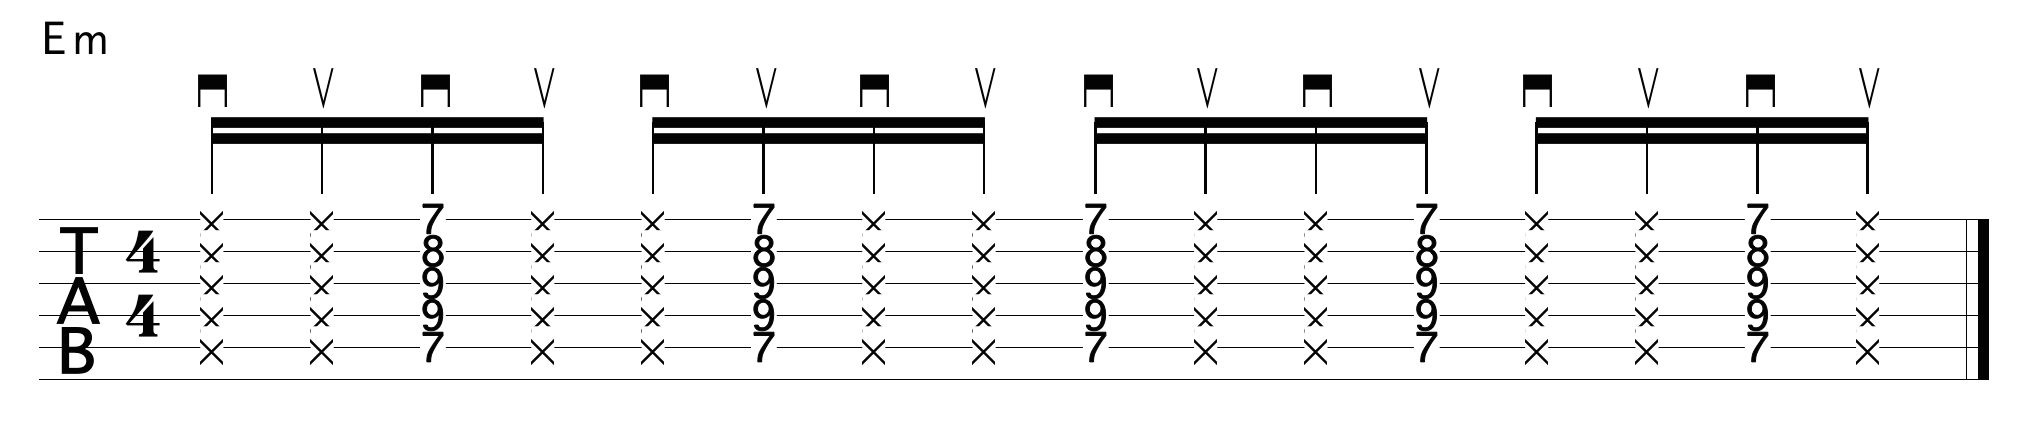 rhythm-guitar-techniques.png